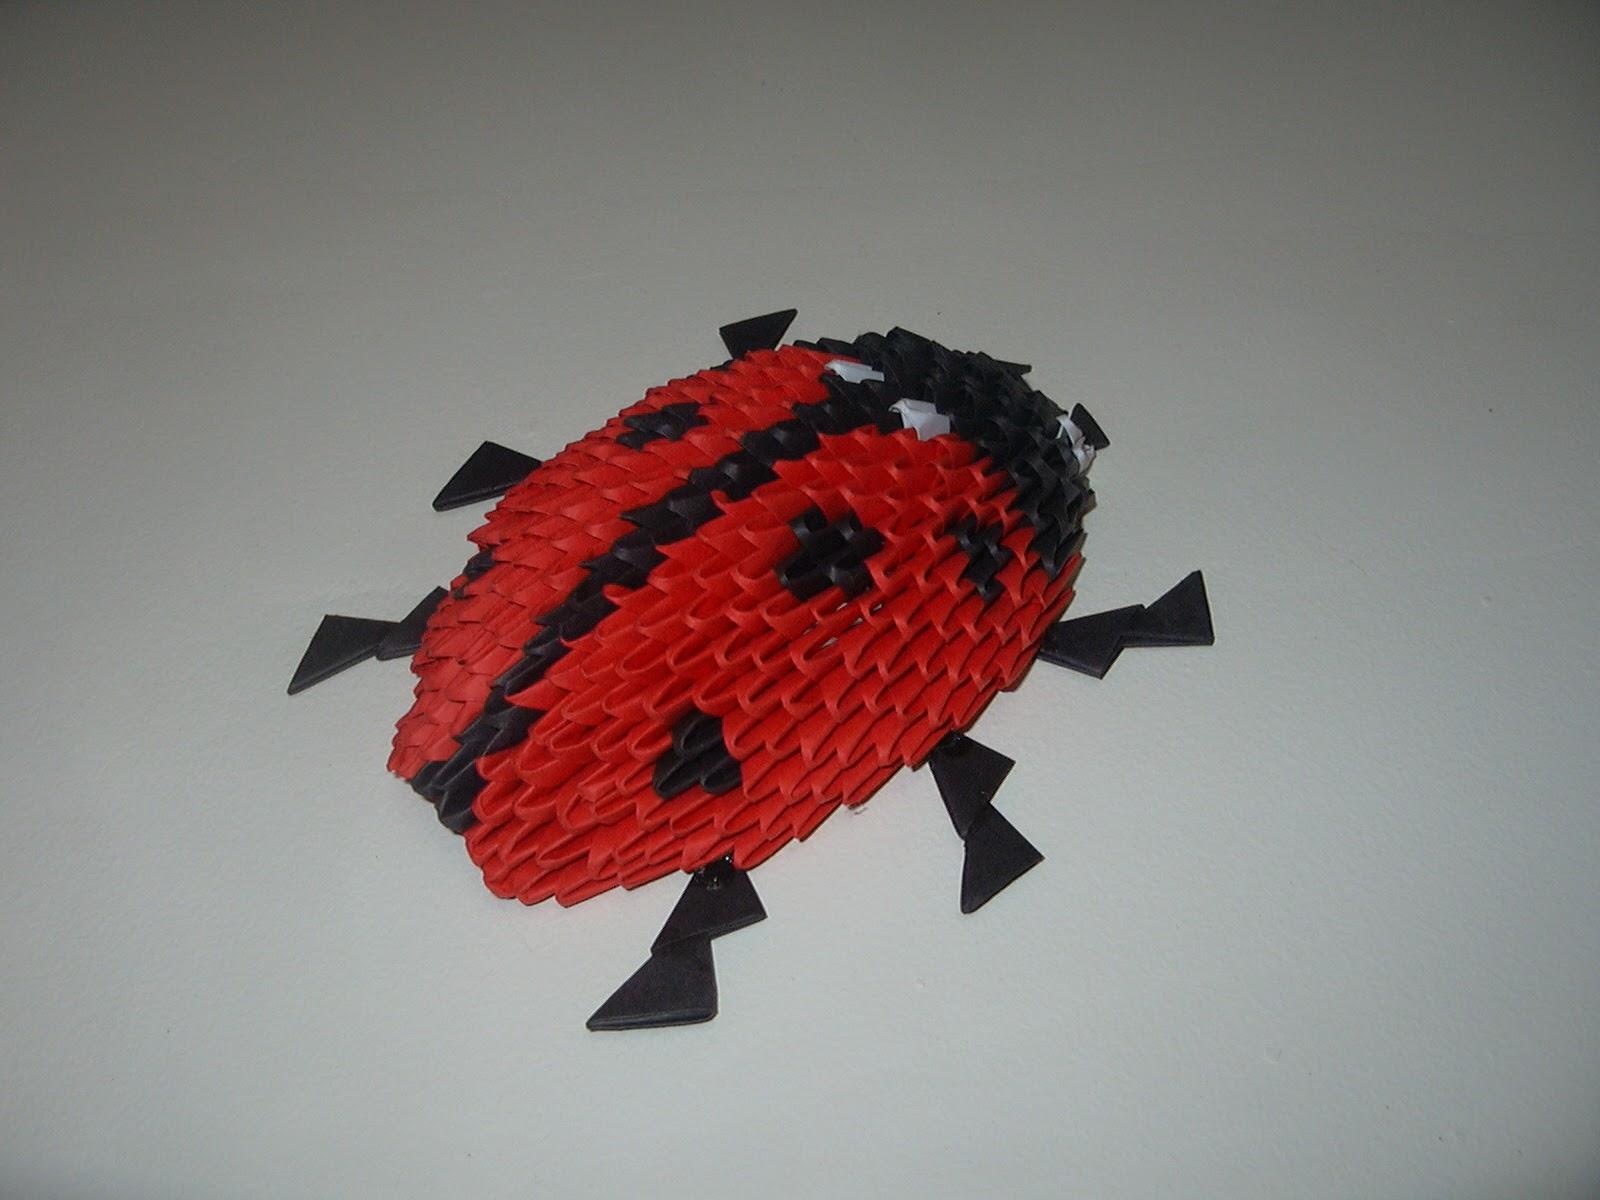 ICHANOKO 3D ORIGAMI INDONESIA: Model 3d origami - ANIMALS - photo#6